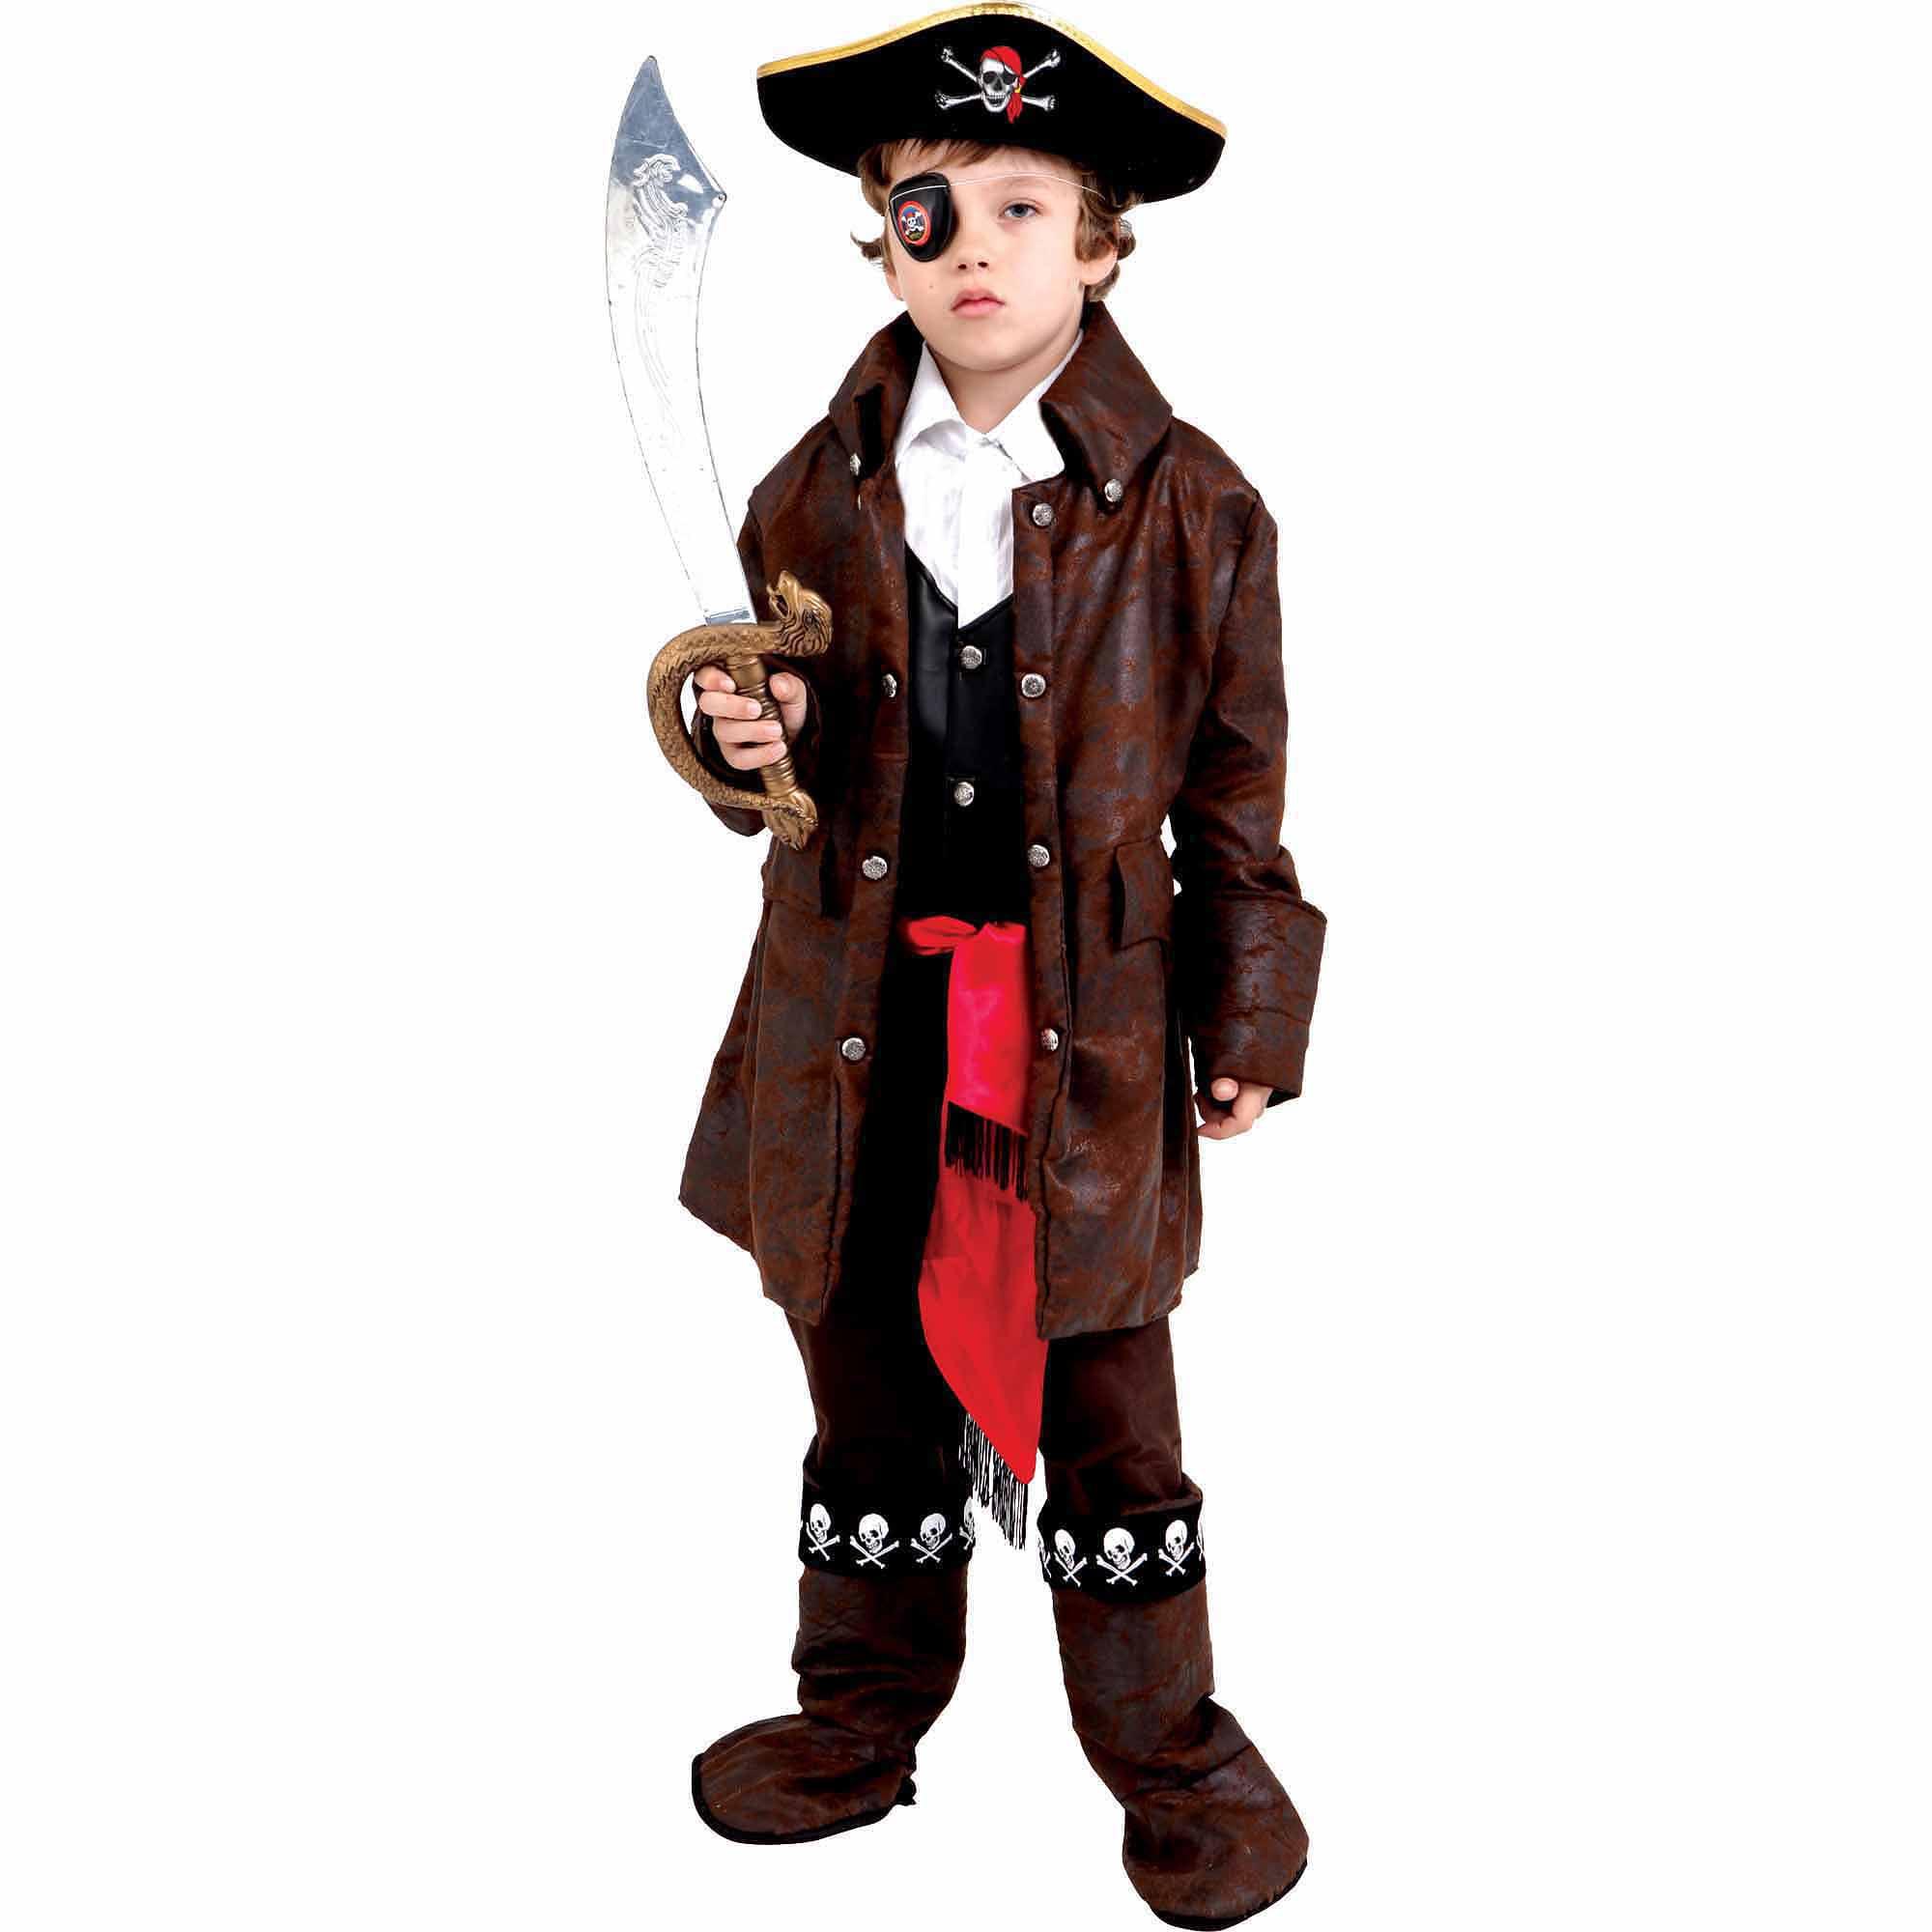 Caribbean Boy Pirate Child Halloween Costume